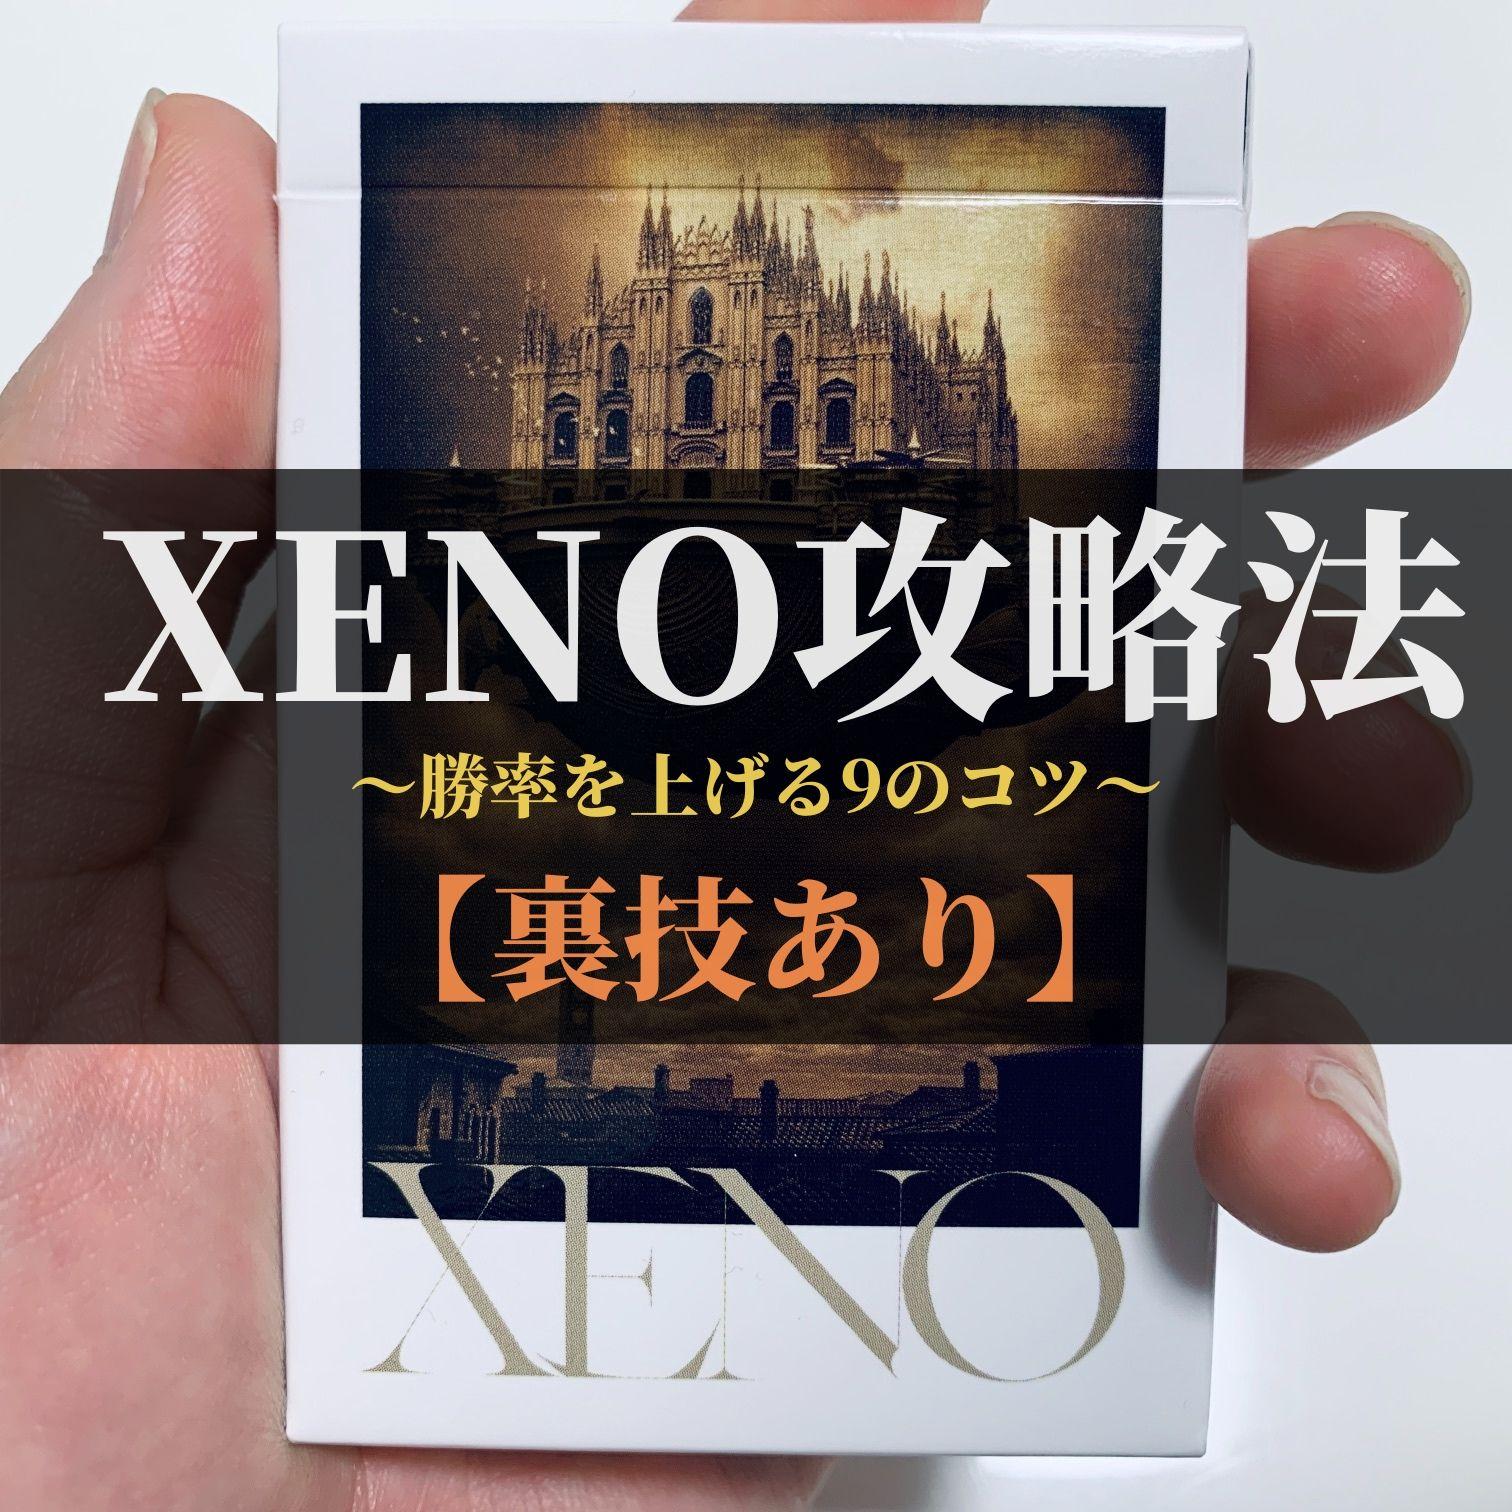 【XENO】攻略法『本当は教えたくない』勝率を上げる具体的9のコツ【裏技あり】